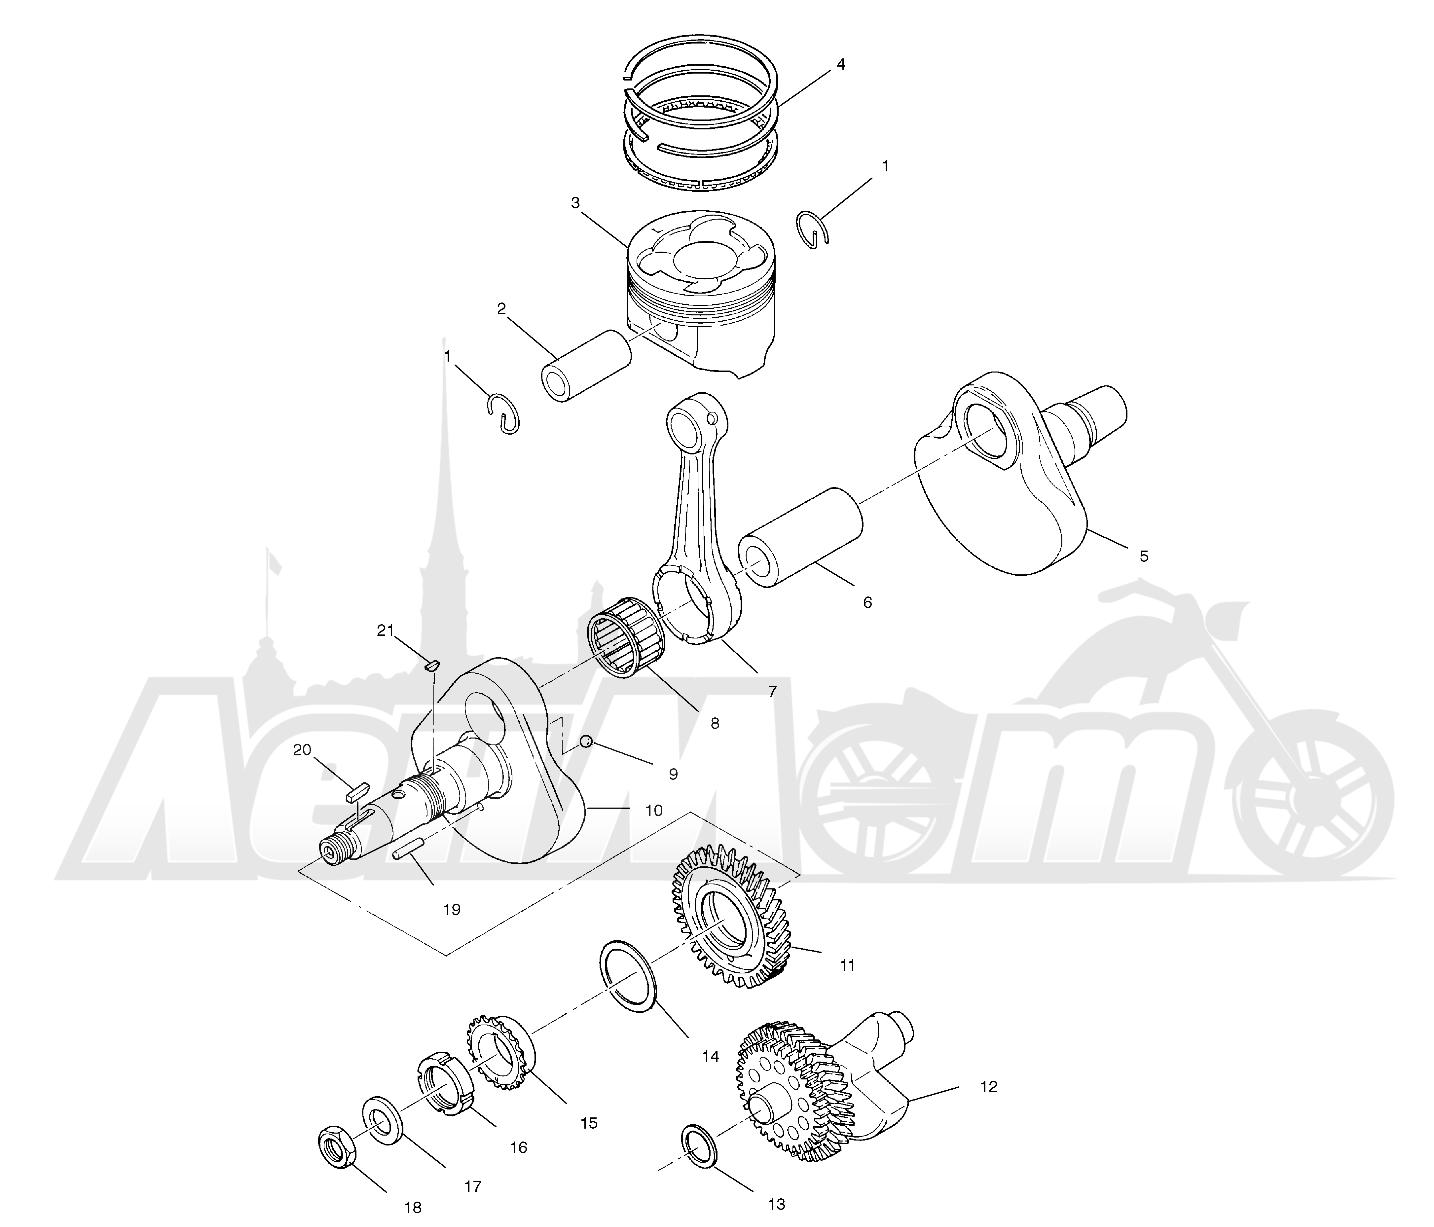 Запчасти для Квадроцикла Polaris 1997 SPORTSMAN 500 - W97CH50A Раздел: CRANKSHAFT AND PISTON - W97CH50A | коленвал и поршень W97CH50A